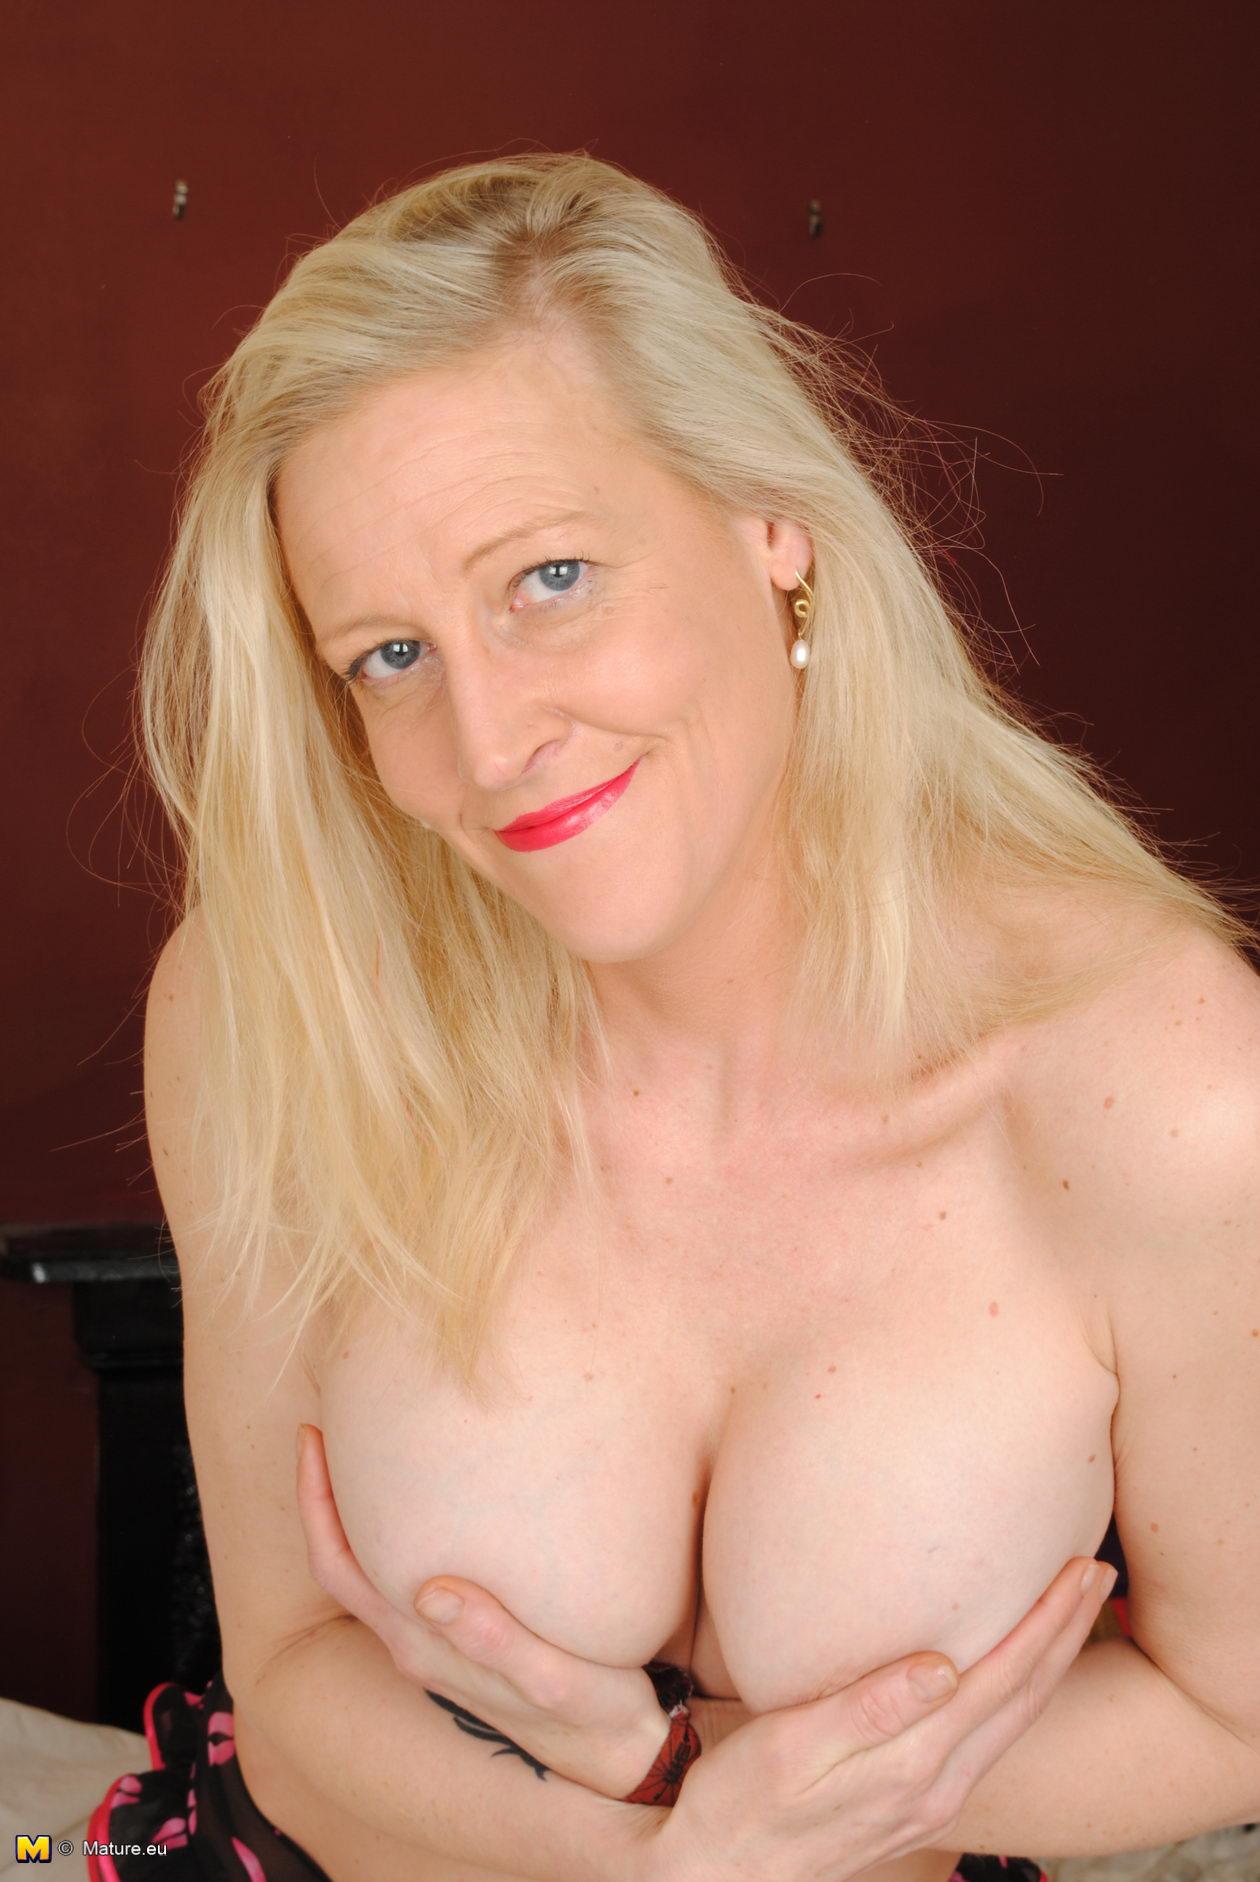 older very nice built tall big boobed nude women